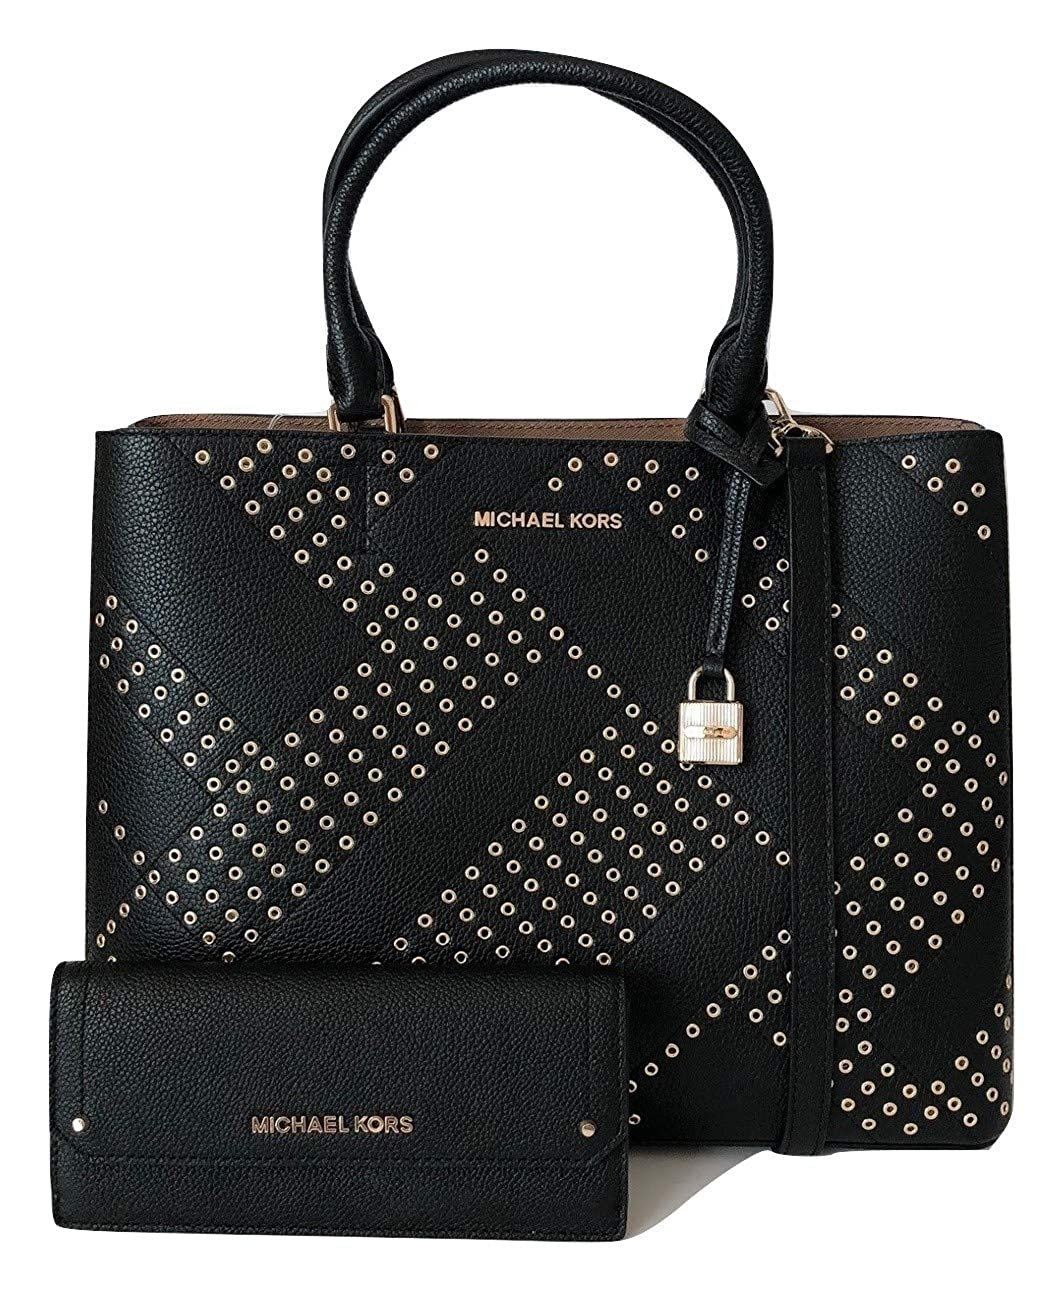 fa7c862b0afcd7 MICHAEL Michael Kors Adele Large North South Tote bundled with Michael Kors  Hayes Flat Wallet (Black/Dark Khaki): Handbags: Amazon.com